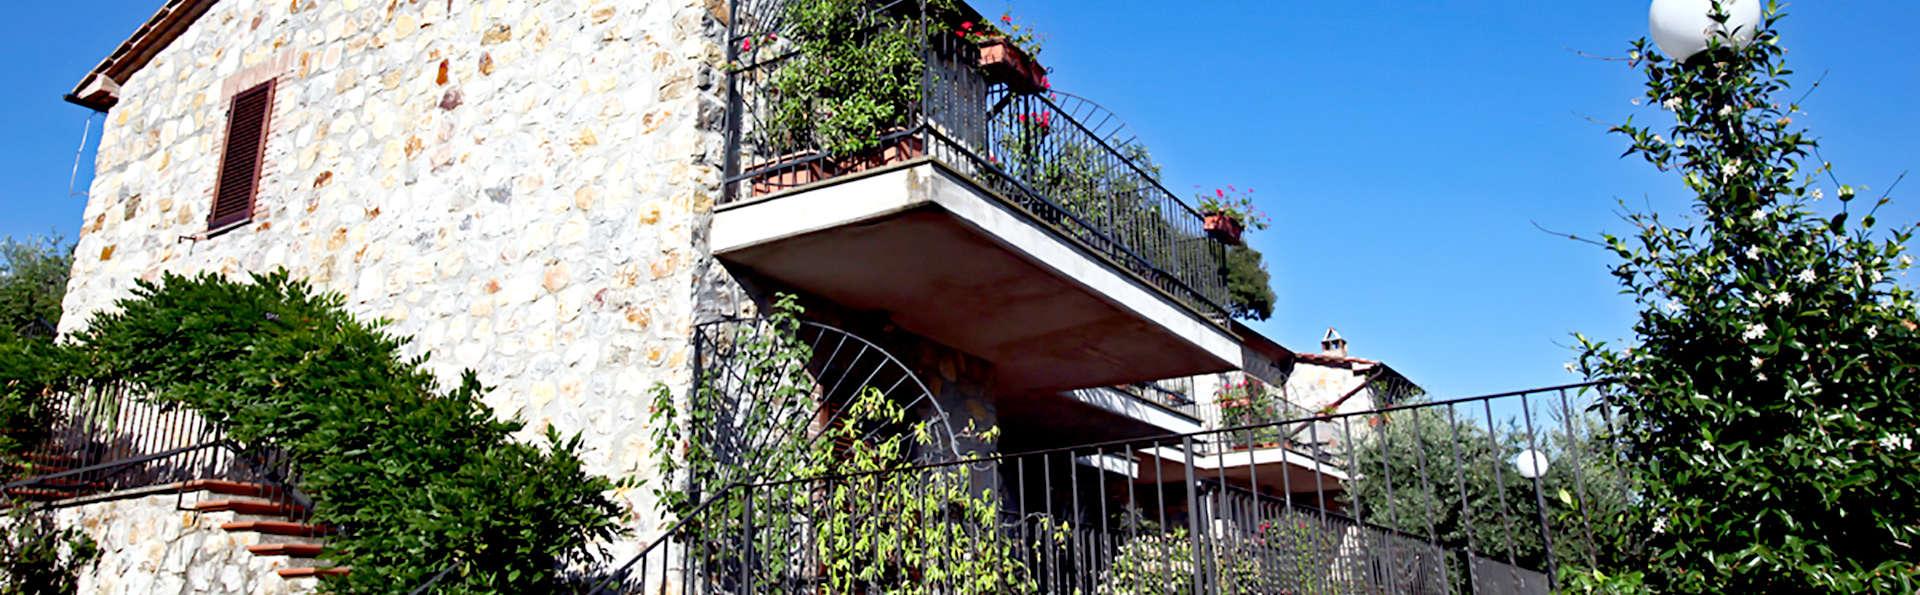 Hotel Resort Antico Casale di Scansano - Edit_Front4.jpg